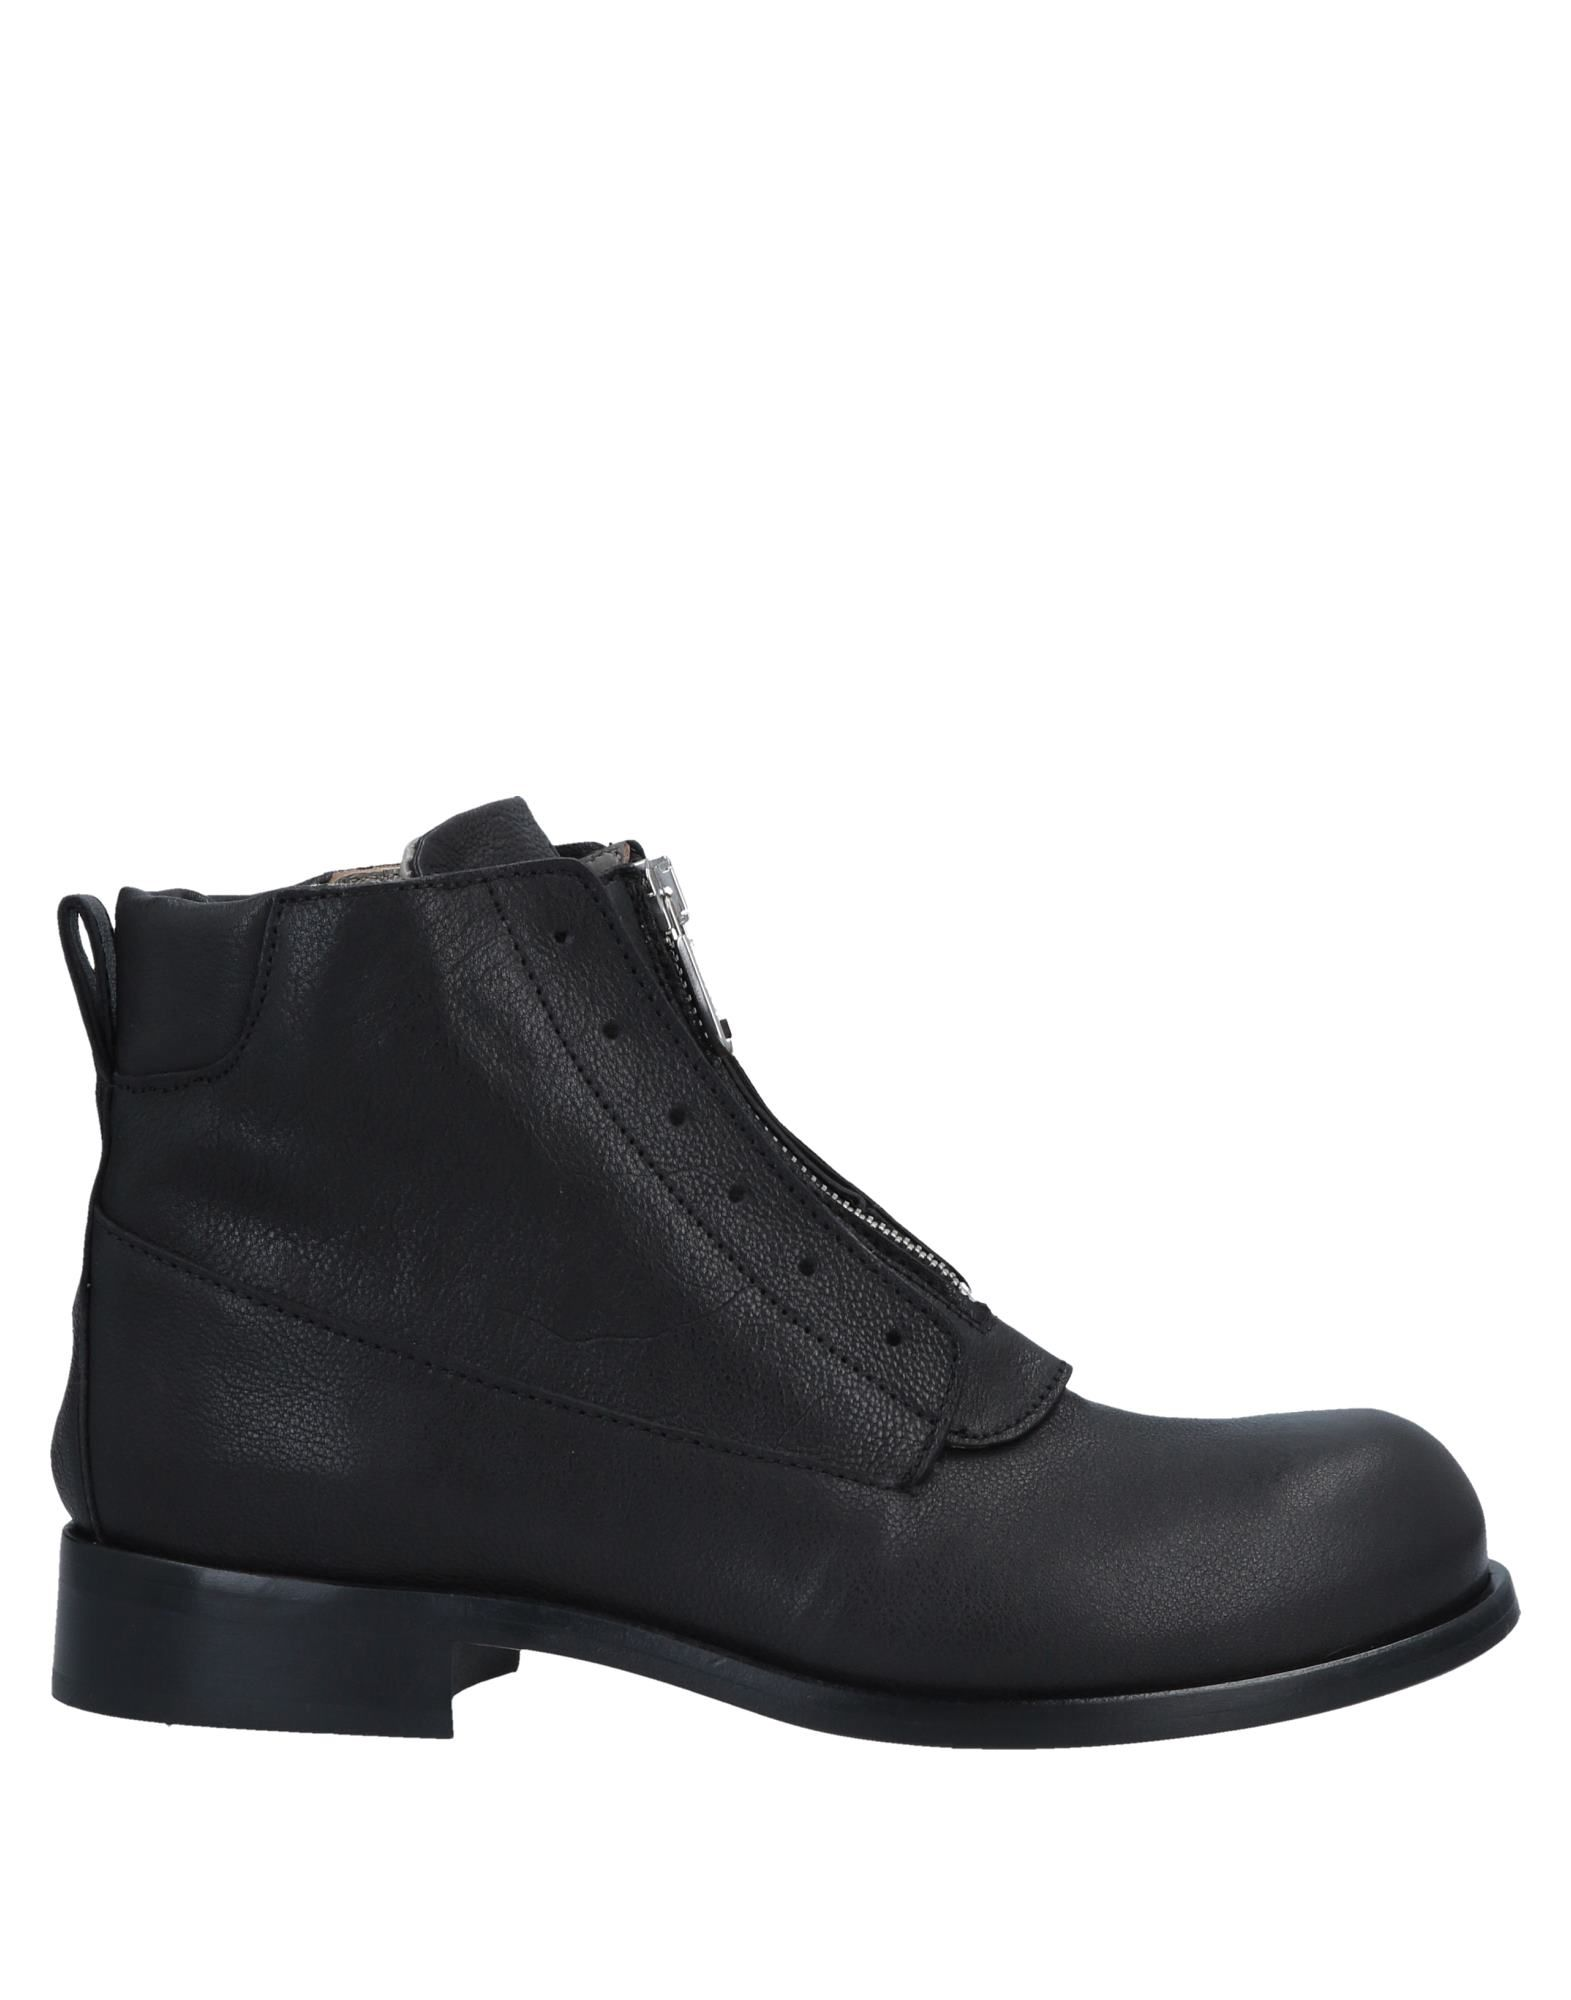 MR MASSIMO REBECCHI Полусапоги и высокие ботинки цены онлайн